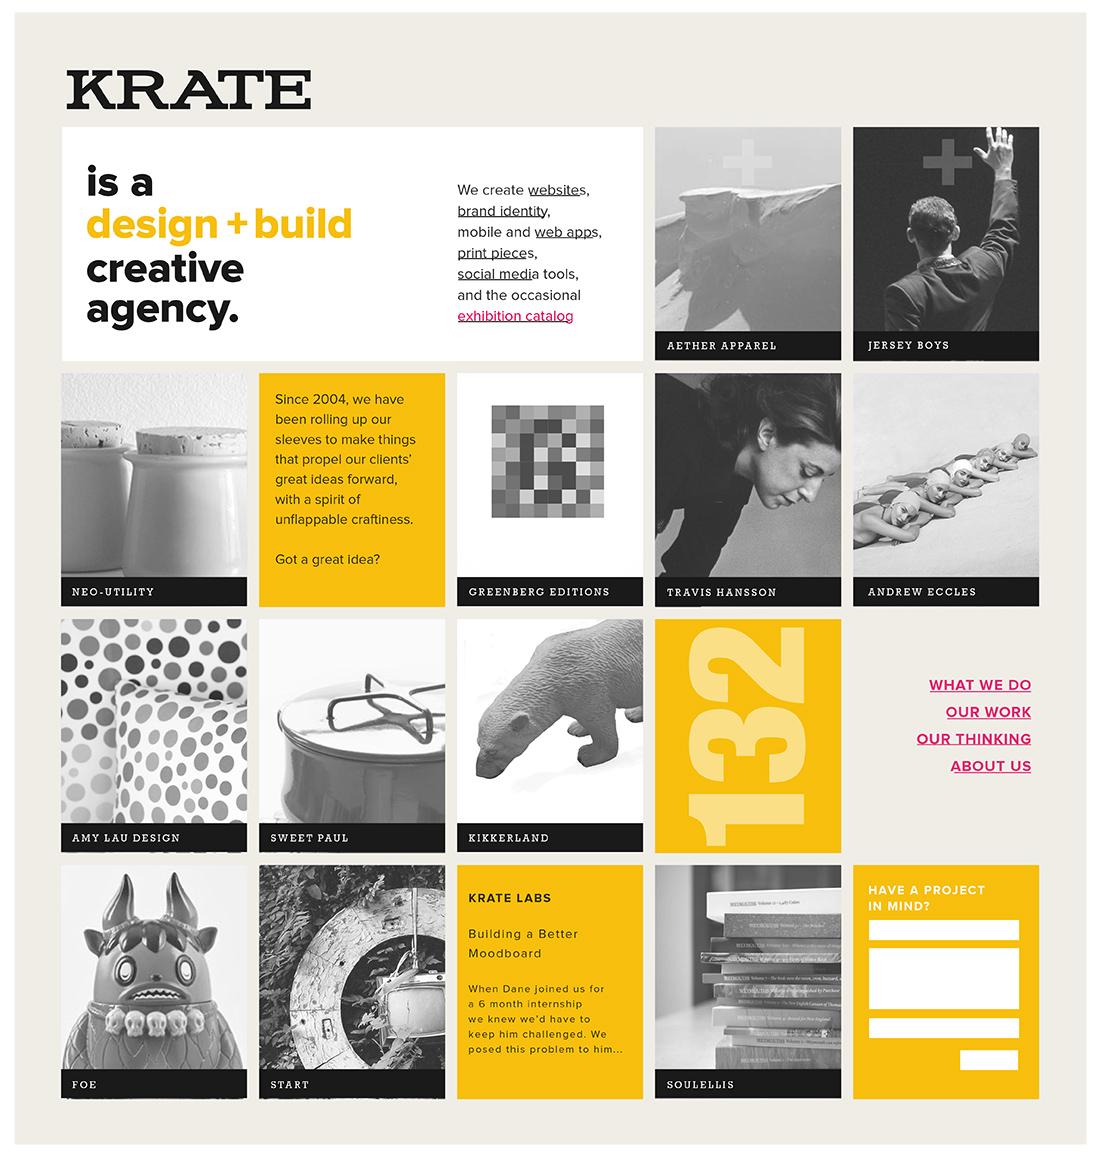 Krate_redesign copy.130117-sample-1.jpg